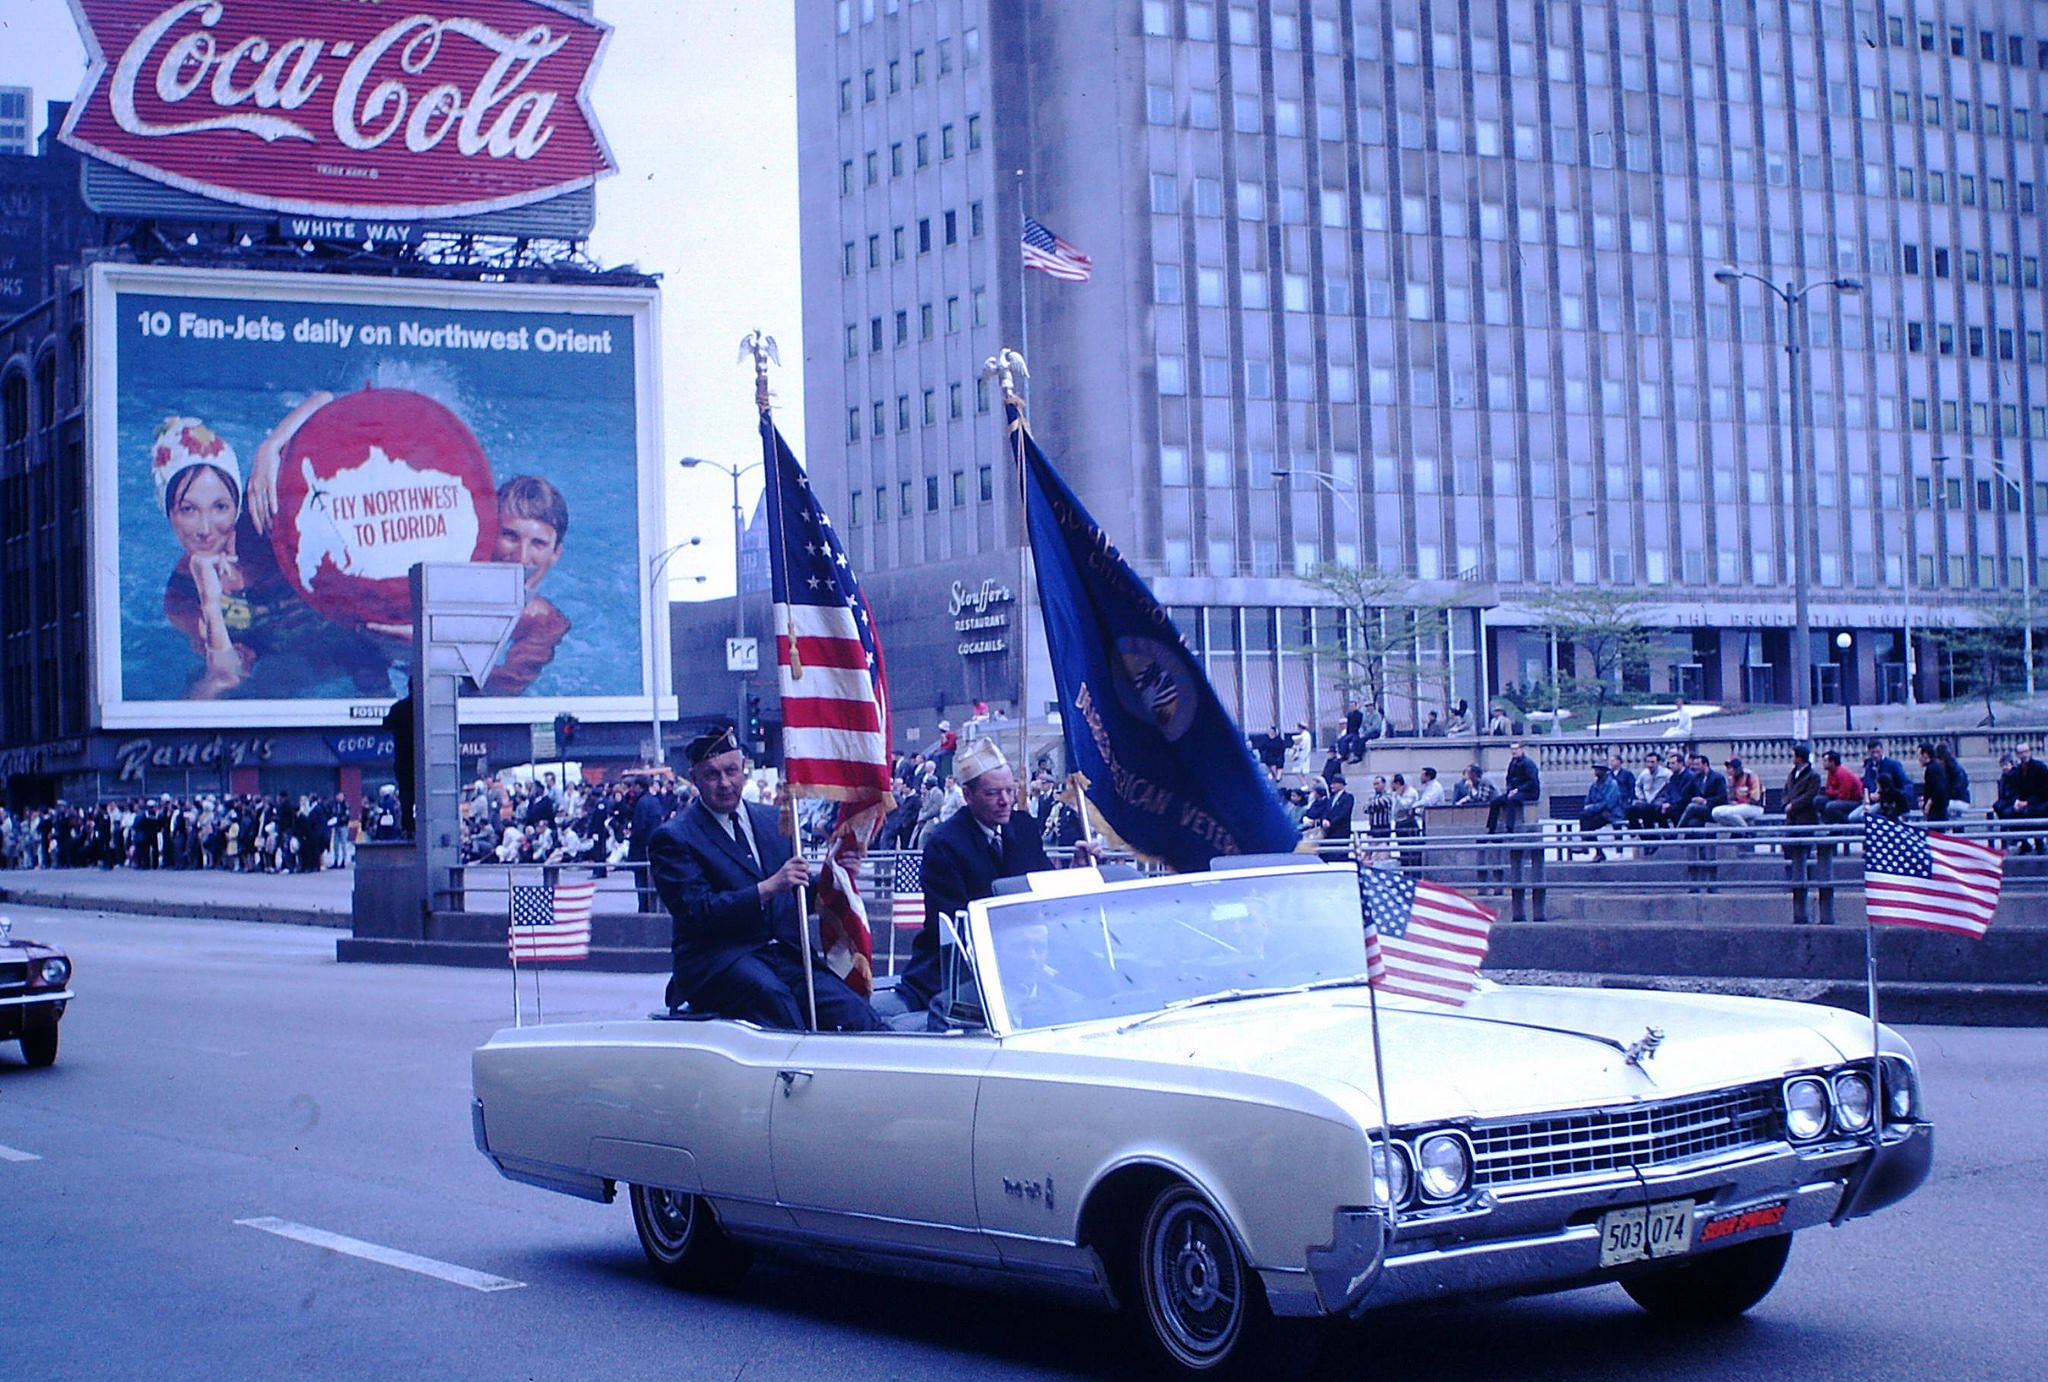 Vintage Found Photo - Chicago Memorial Day Parade 1967 | Cars